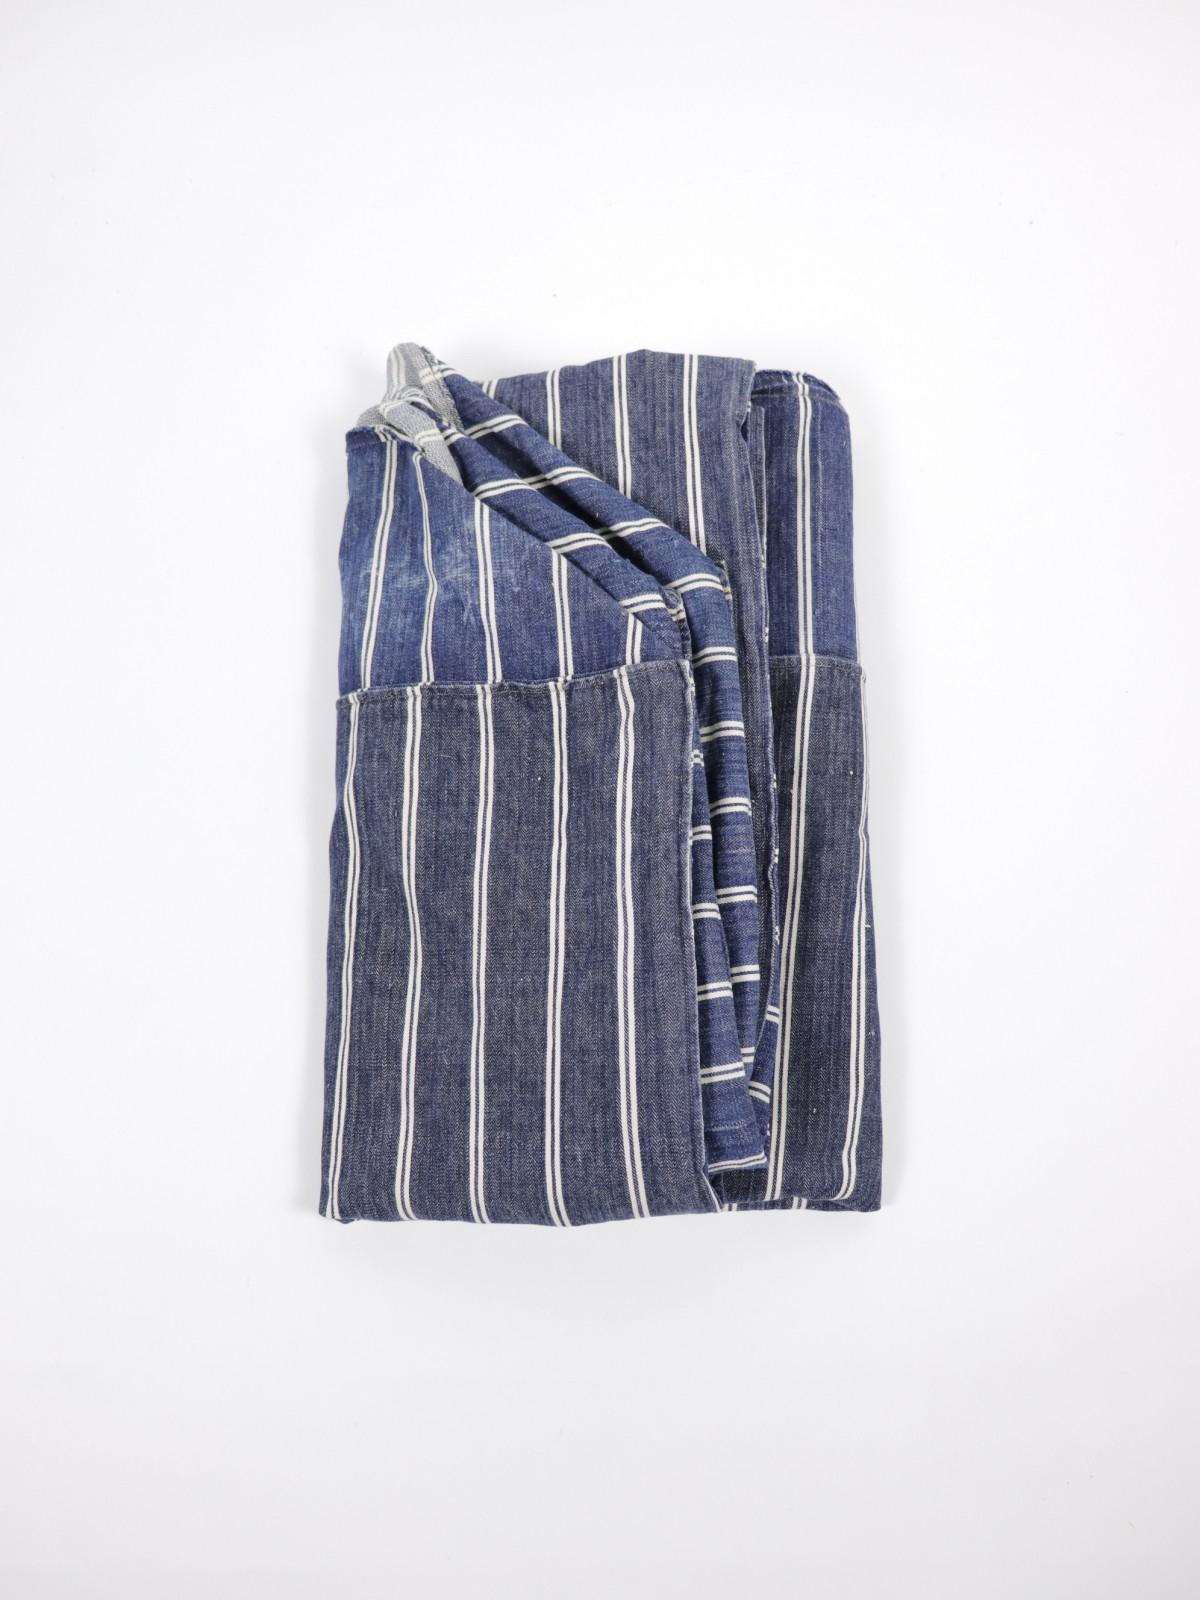 1960's , Italian denim fabric, upholstery fabric, Italy